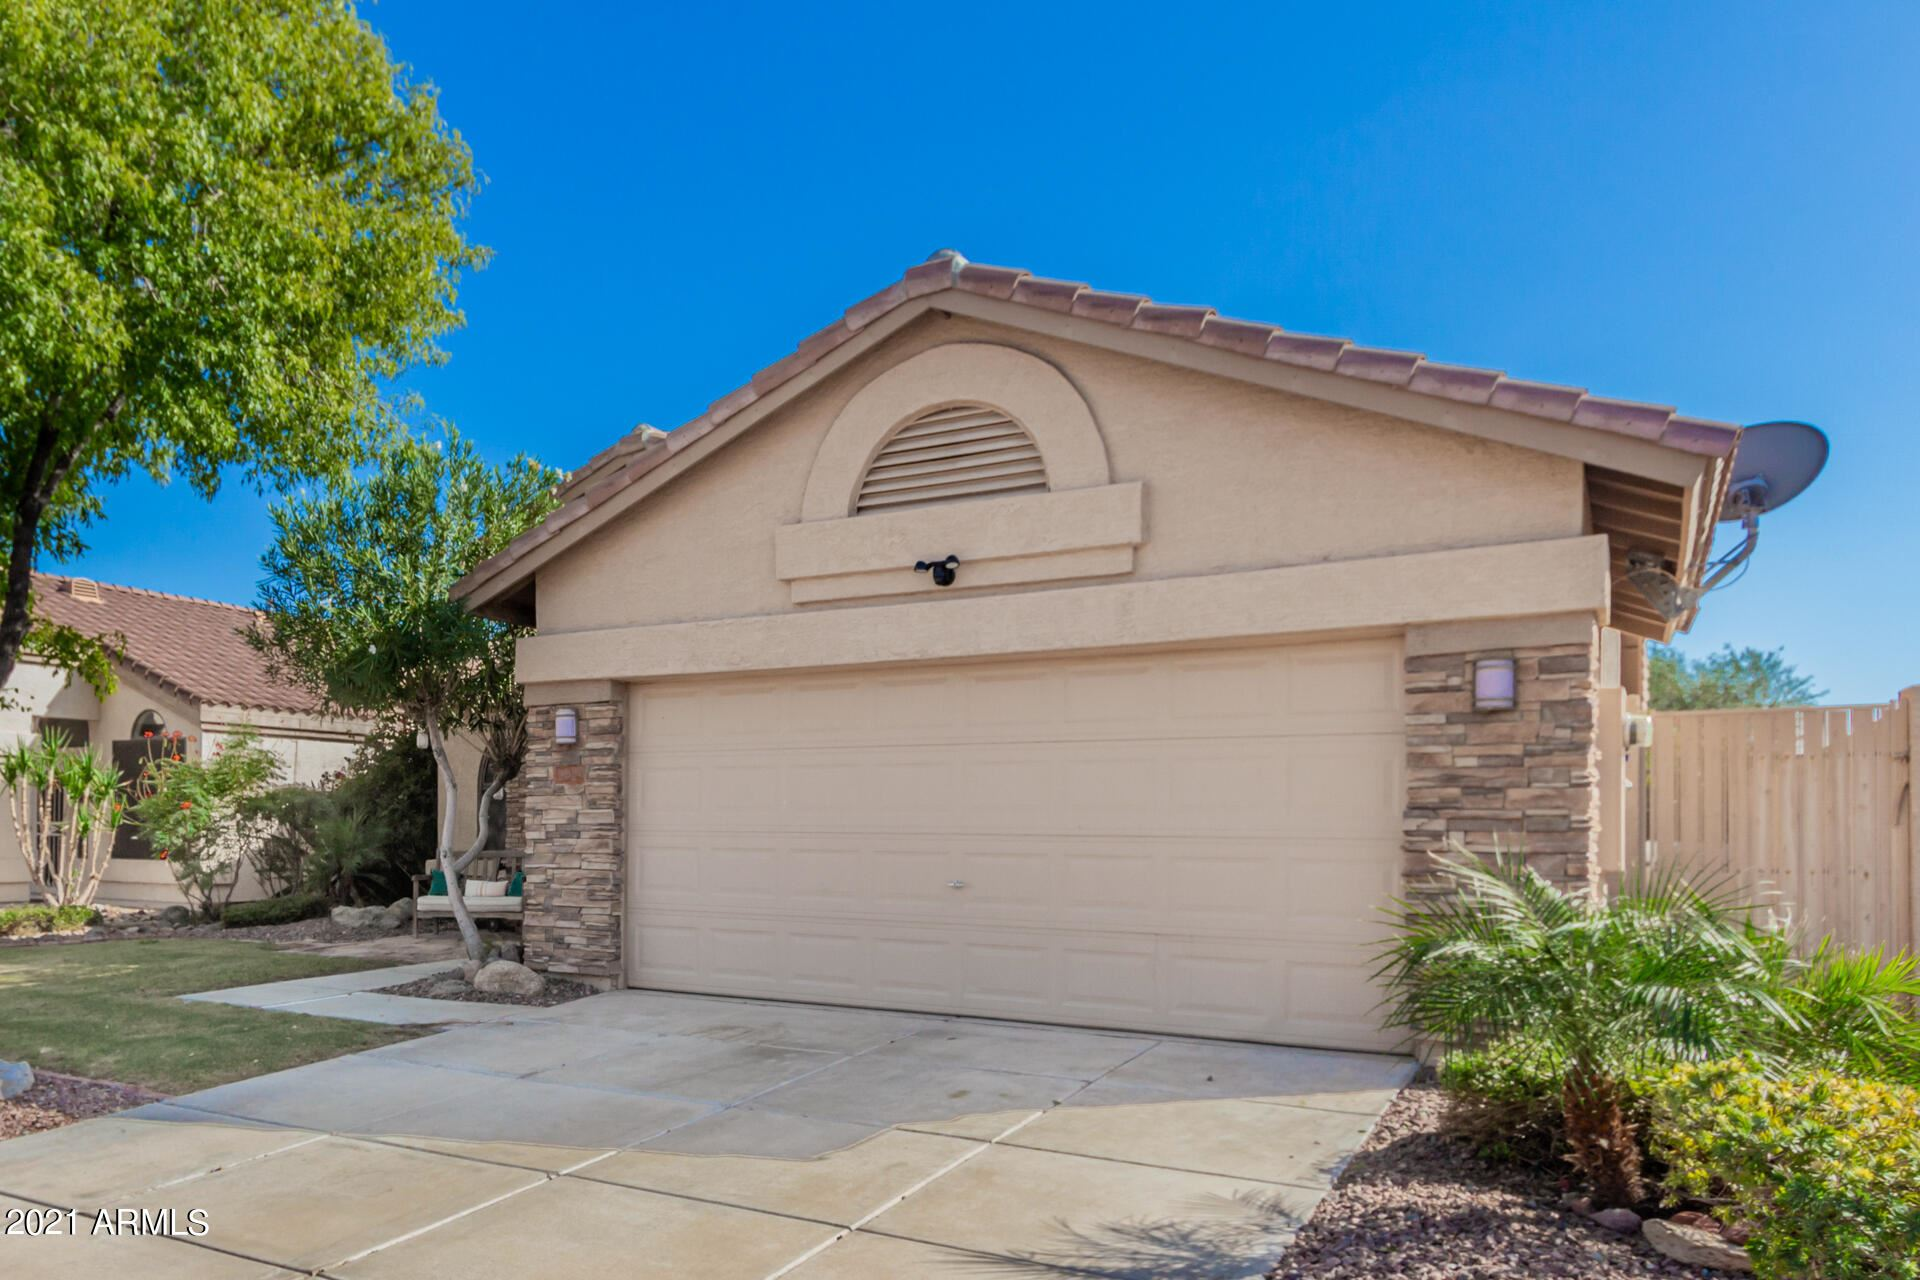 Photo of 3929 W TONOPAH Drive, Glendale, AZ 85308 (MLS # 6307630)